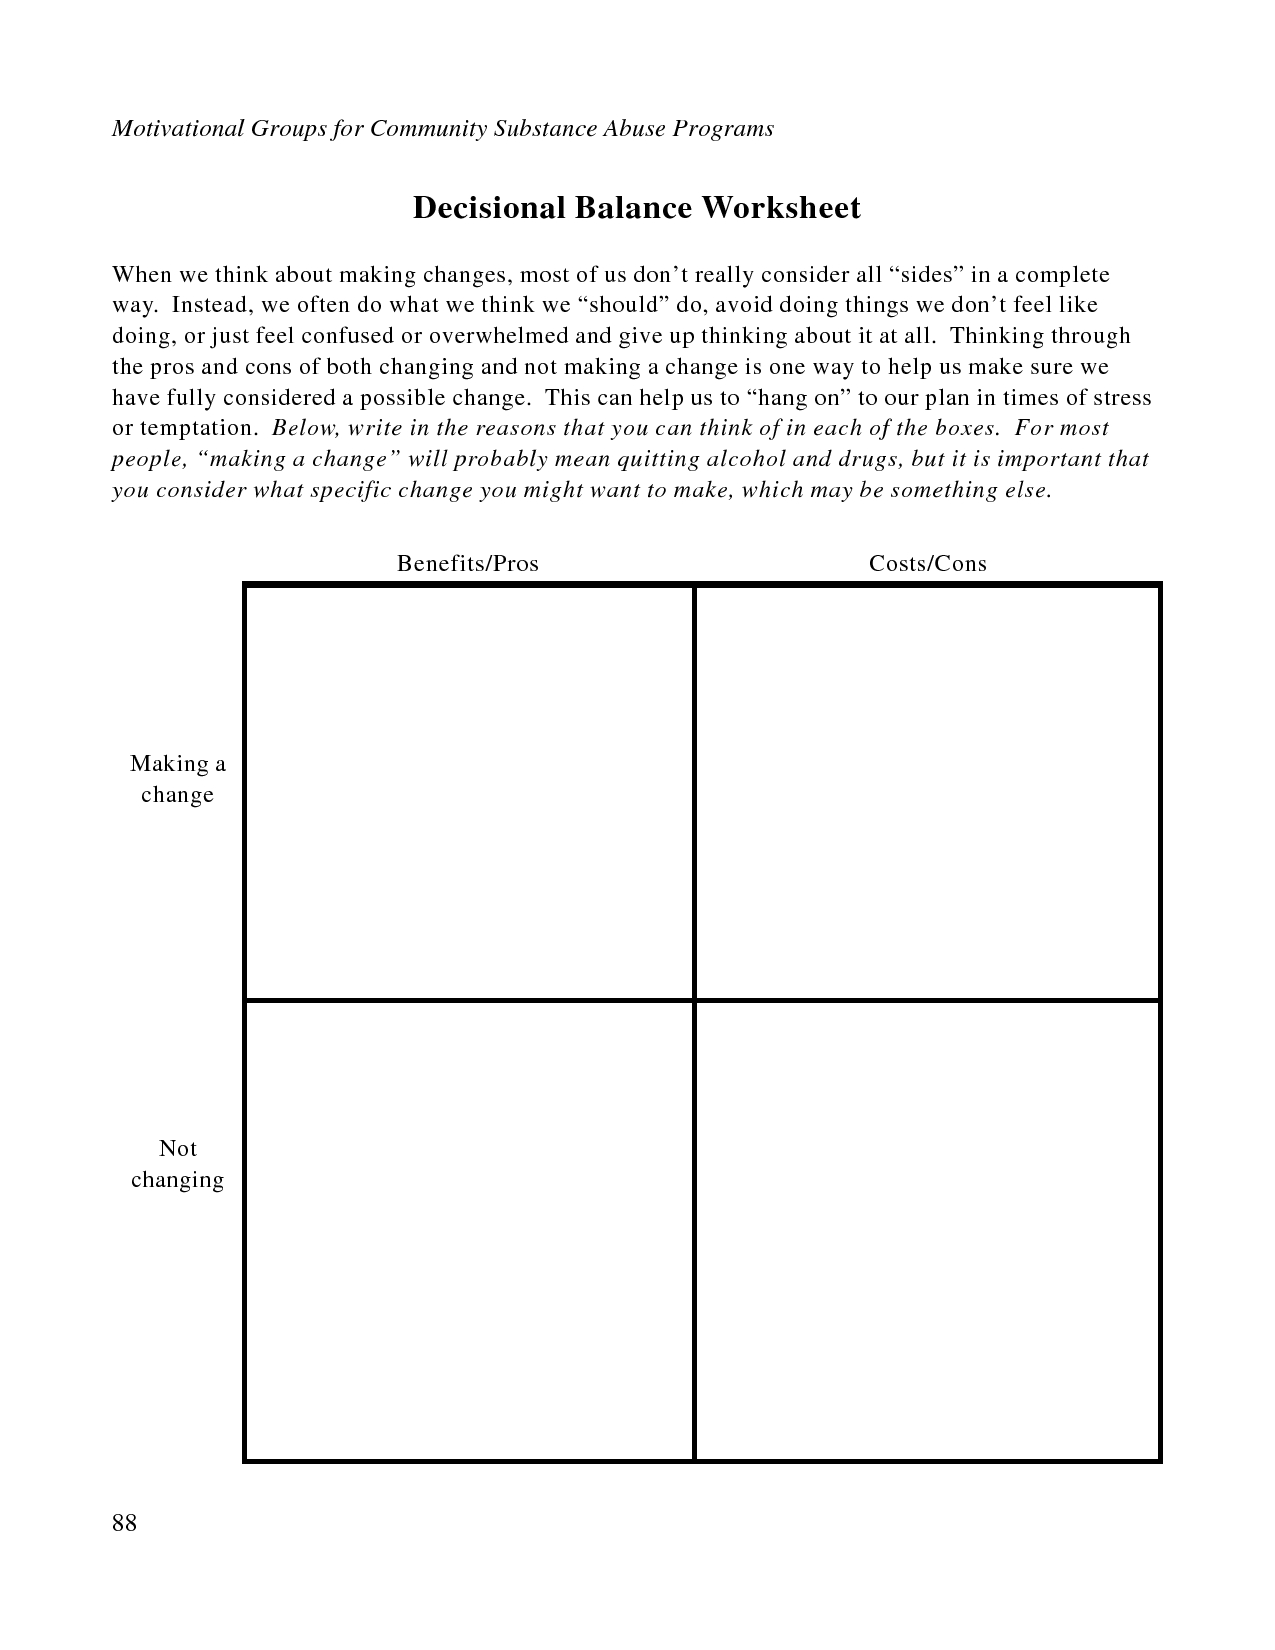 Free Printable Dbt Worksheets | Decisional Balance Worksheet - Pdf - Free Printable Recovery Games